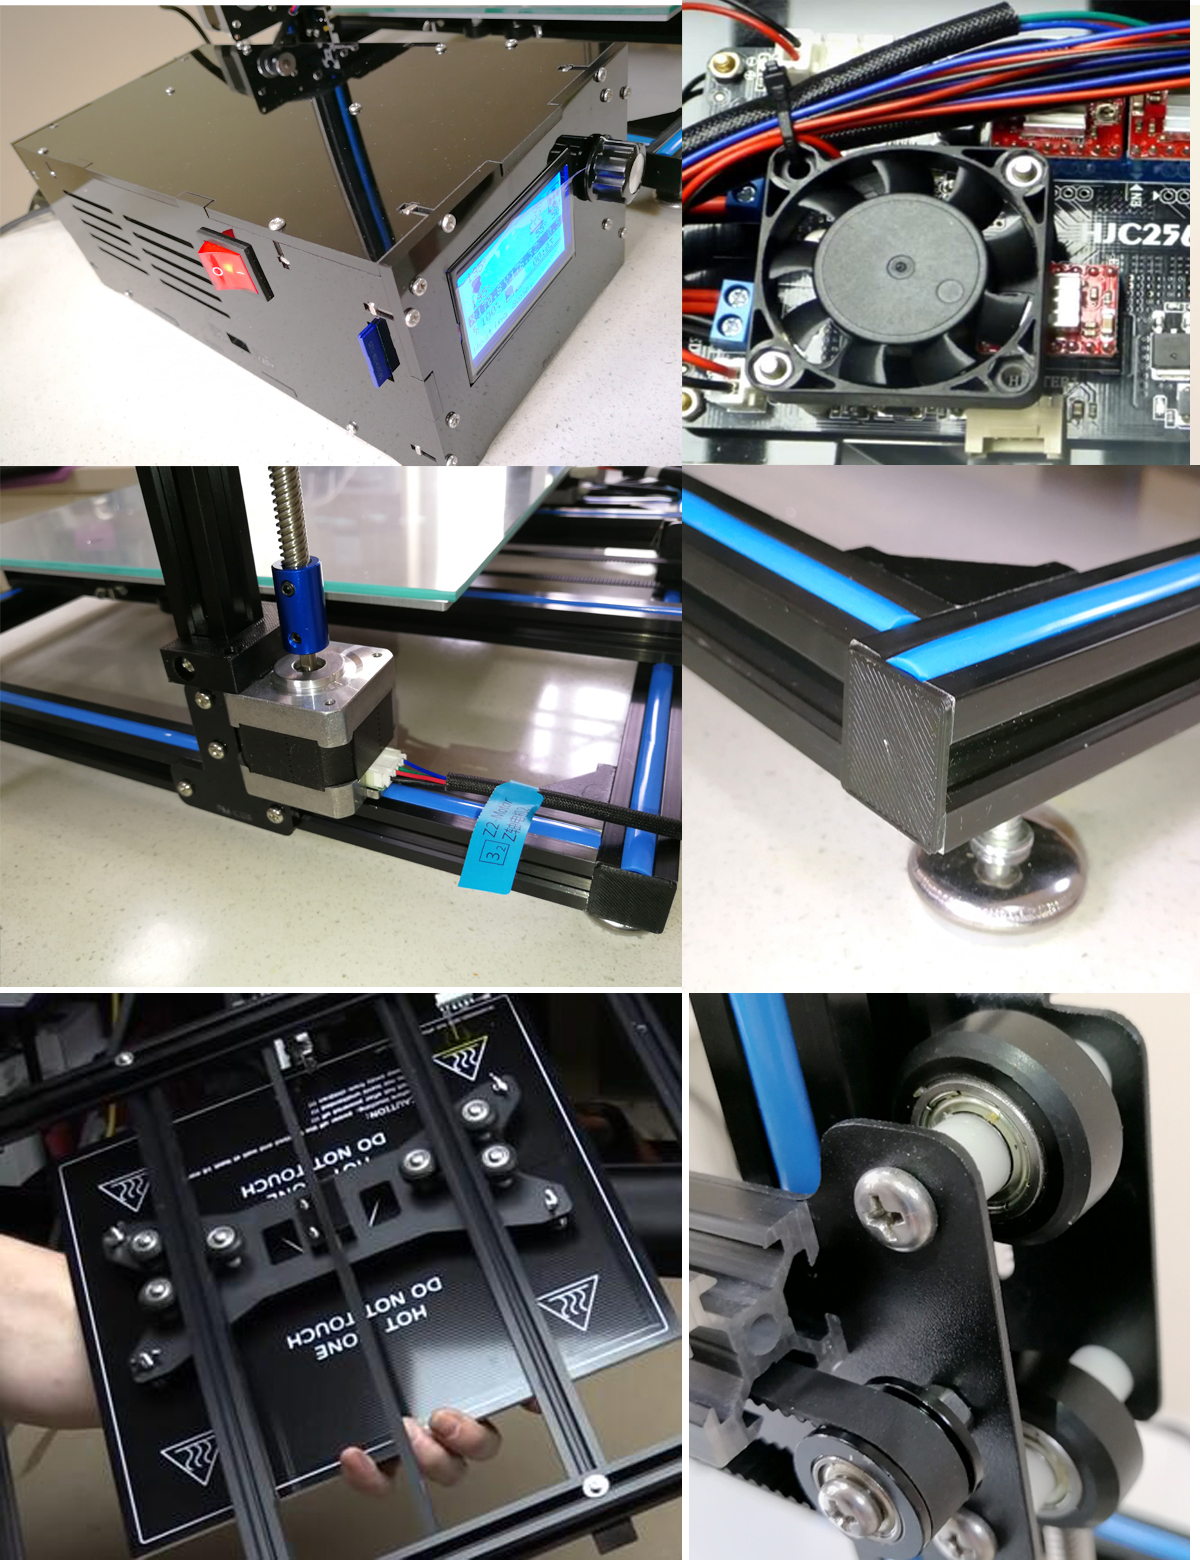 Forums - ADIMLab 3D Printer - Groups - Thingiverse